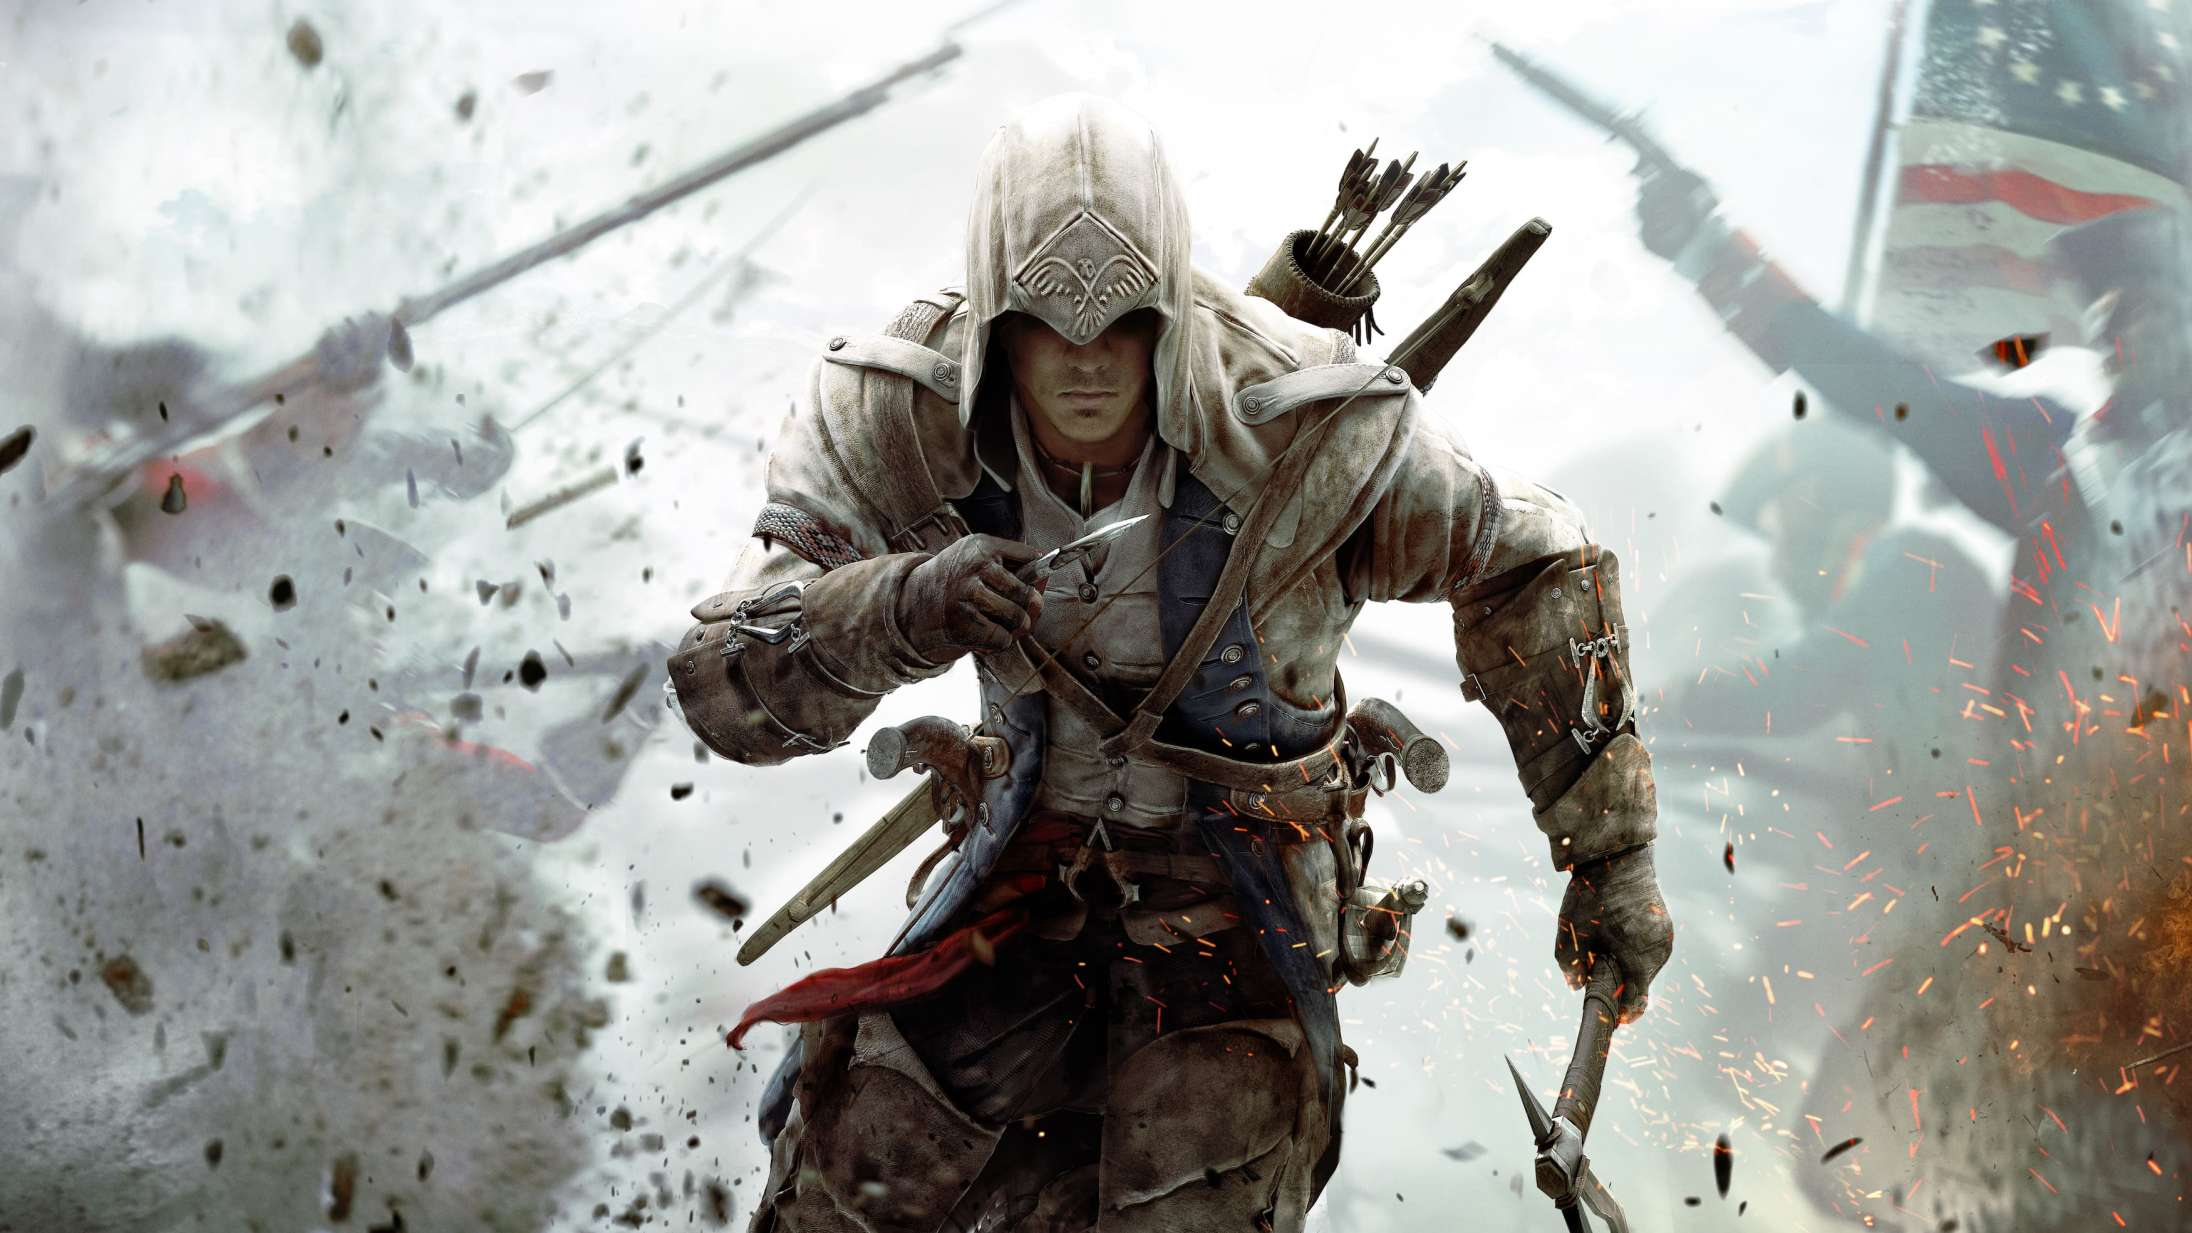 Her er tre bud på, hvordan Netflix kan filmatisere 'Assassin's Creed'